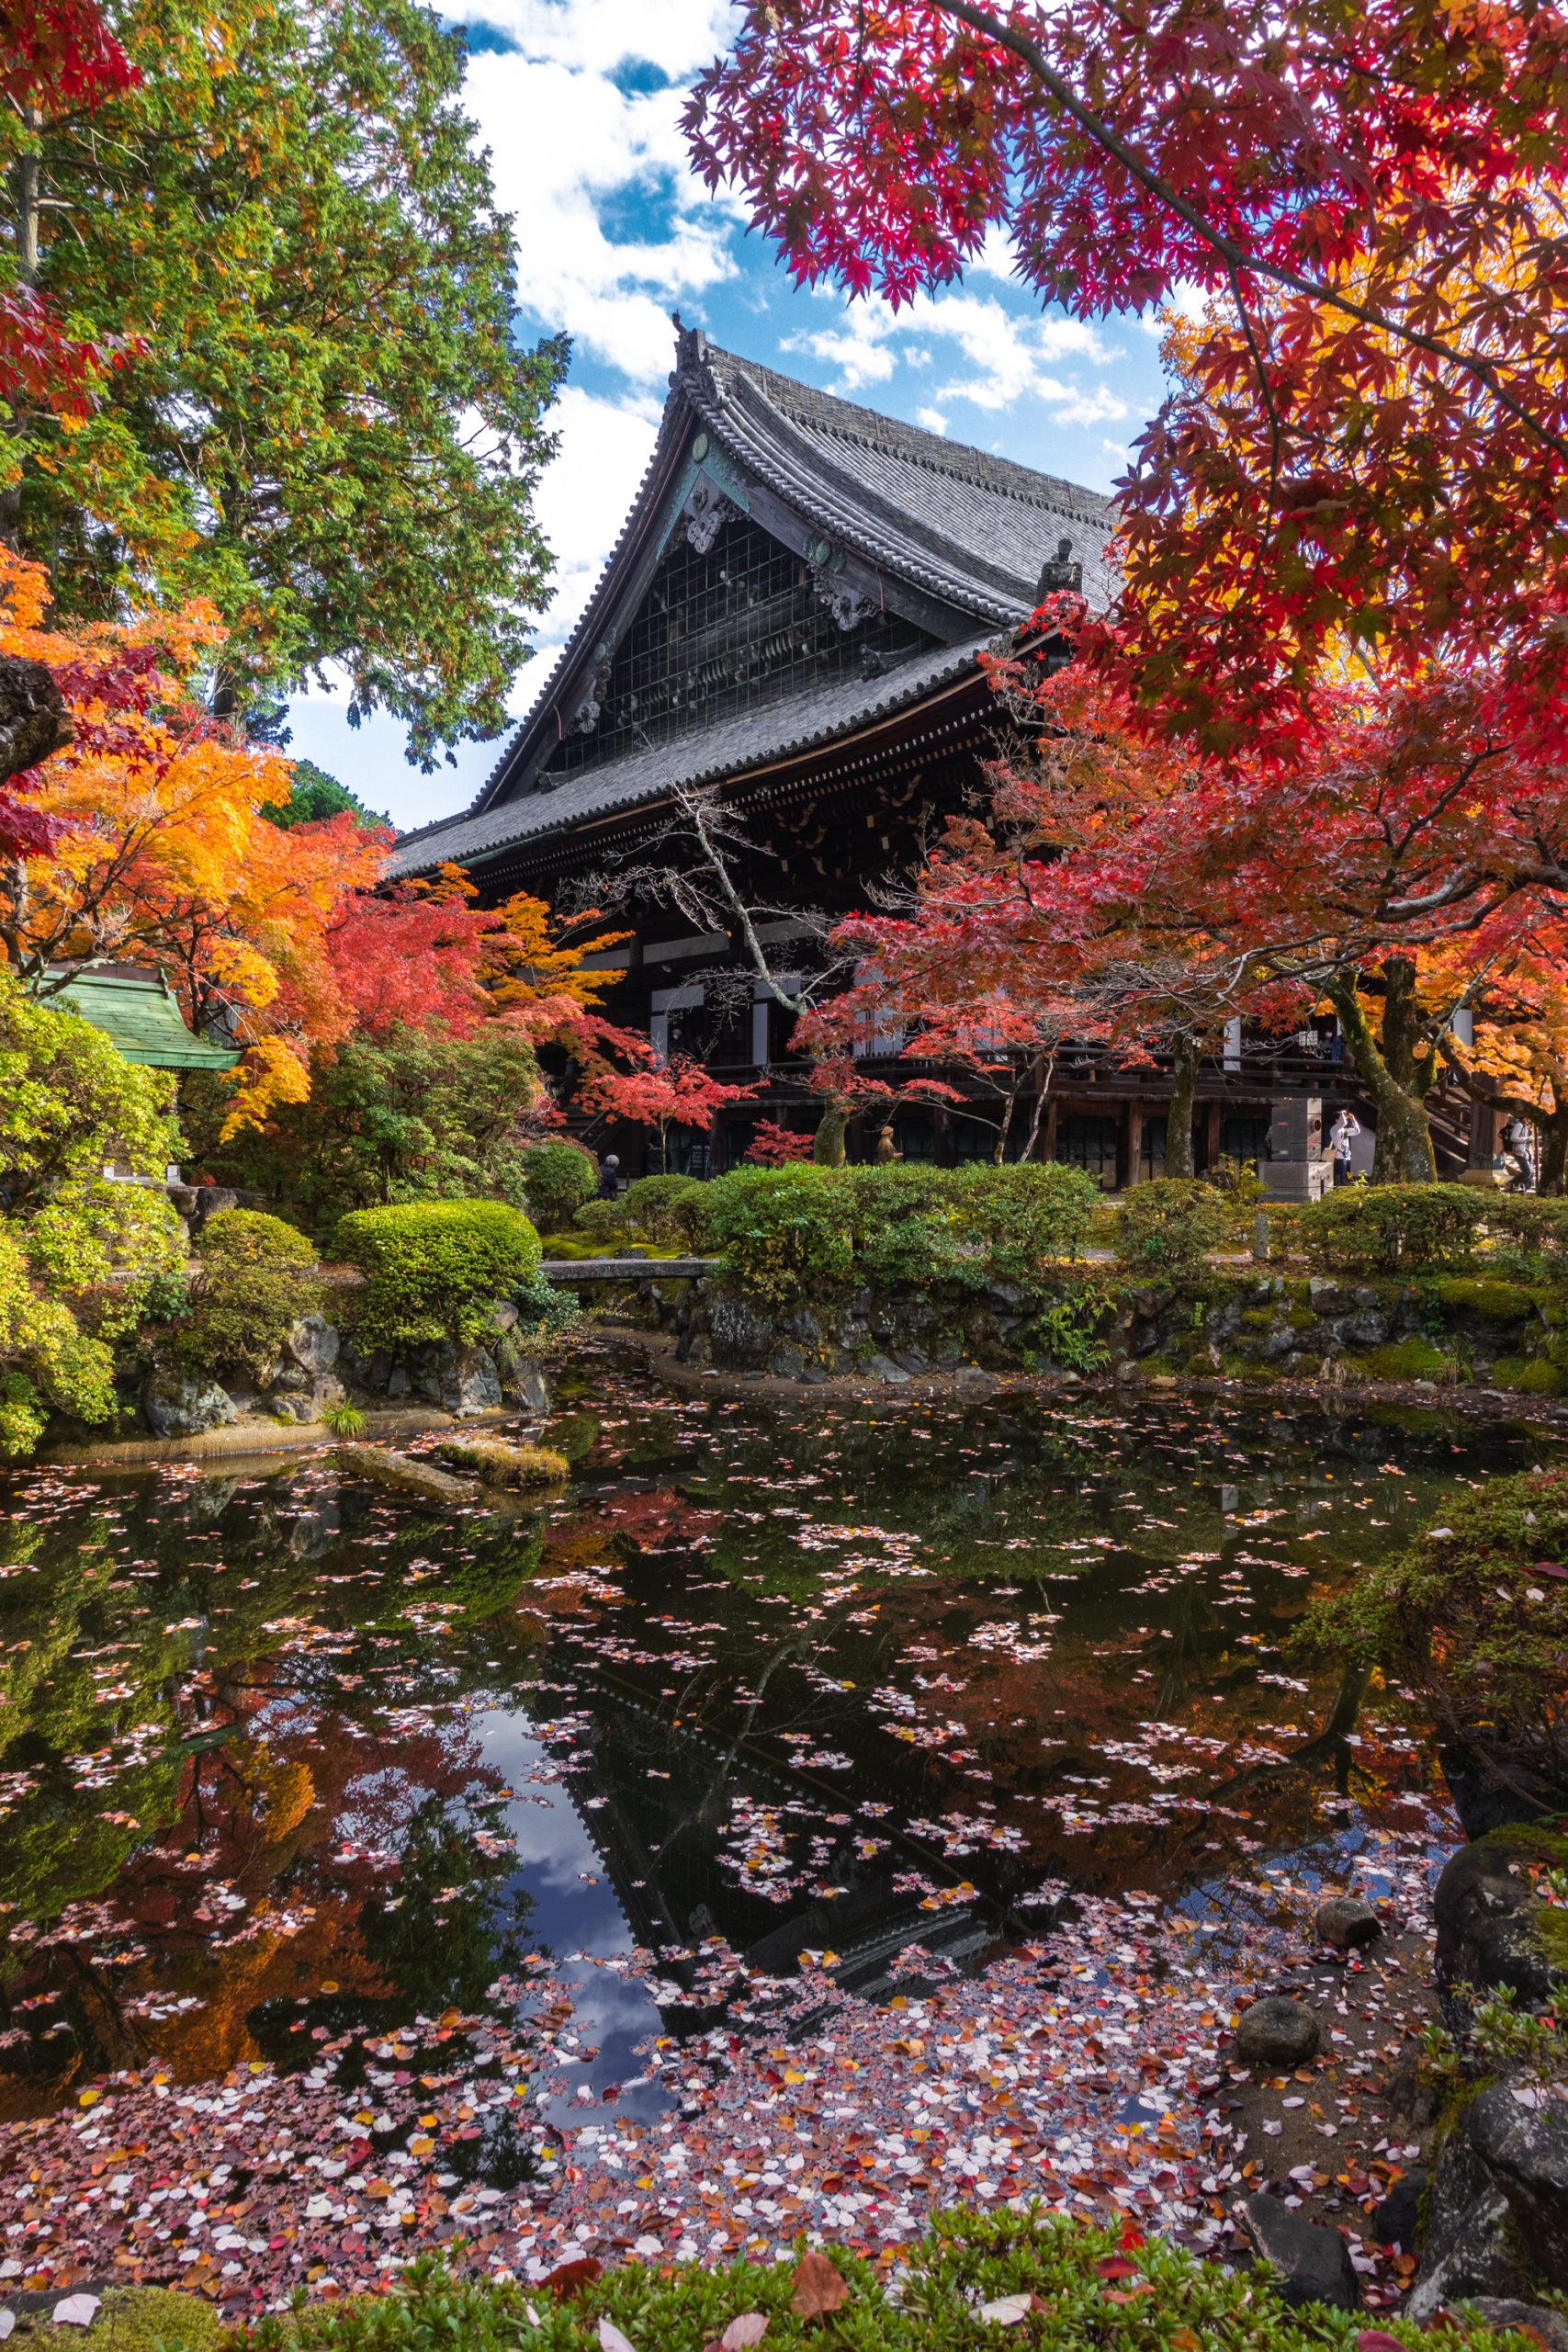 DSC00754-scaled 京都  真如堂(三重塔と紅葉の風情を感じる景色が美しい秋におすすめのスポット!撮影した写真の紹介、アクセス情報など)